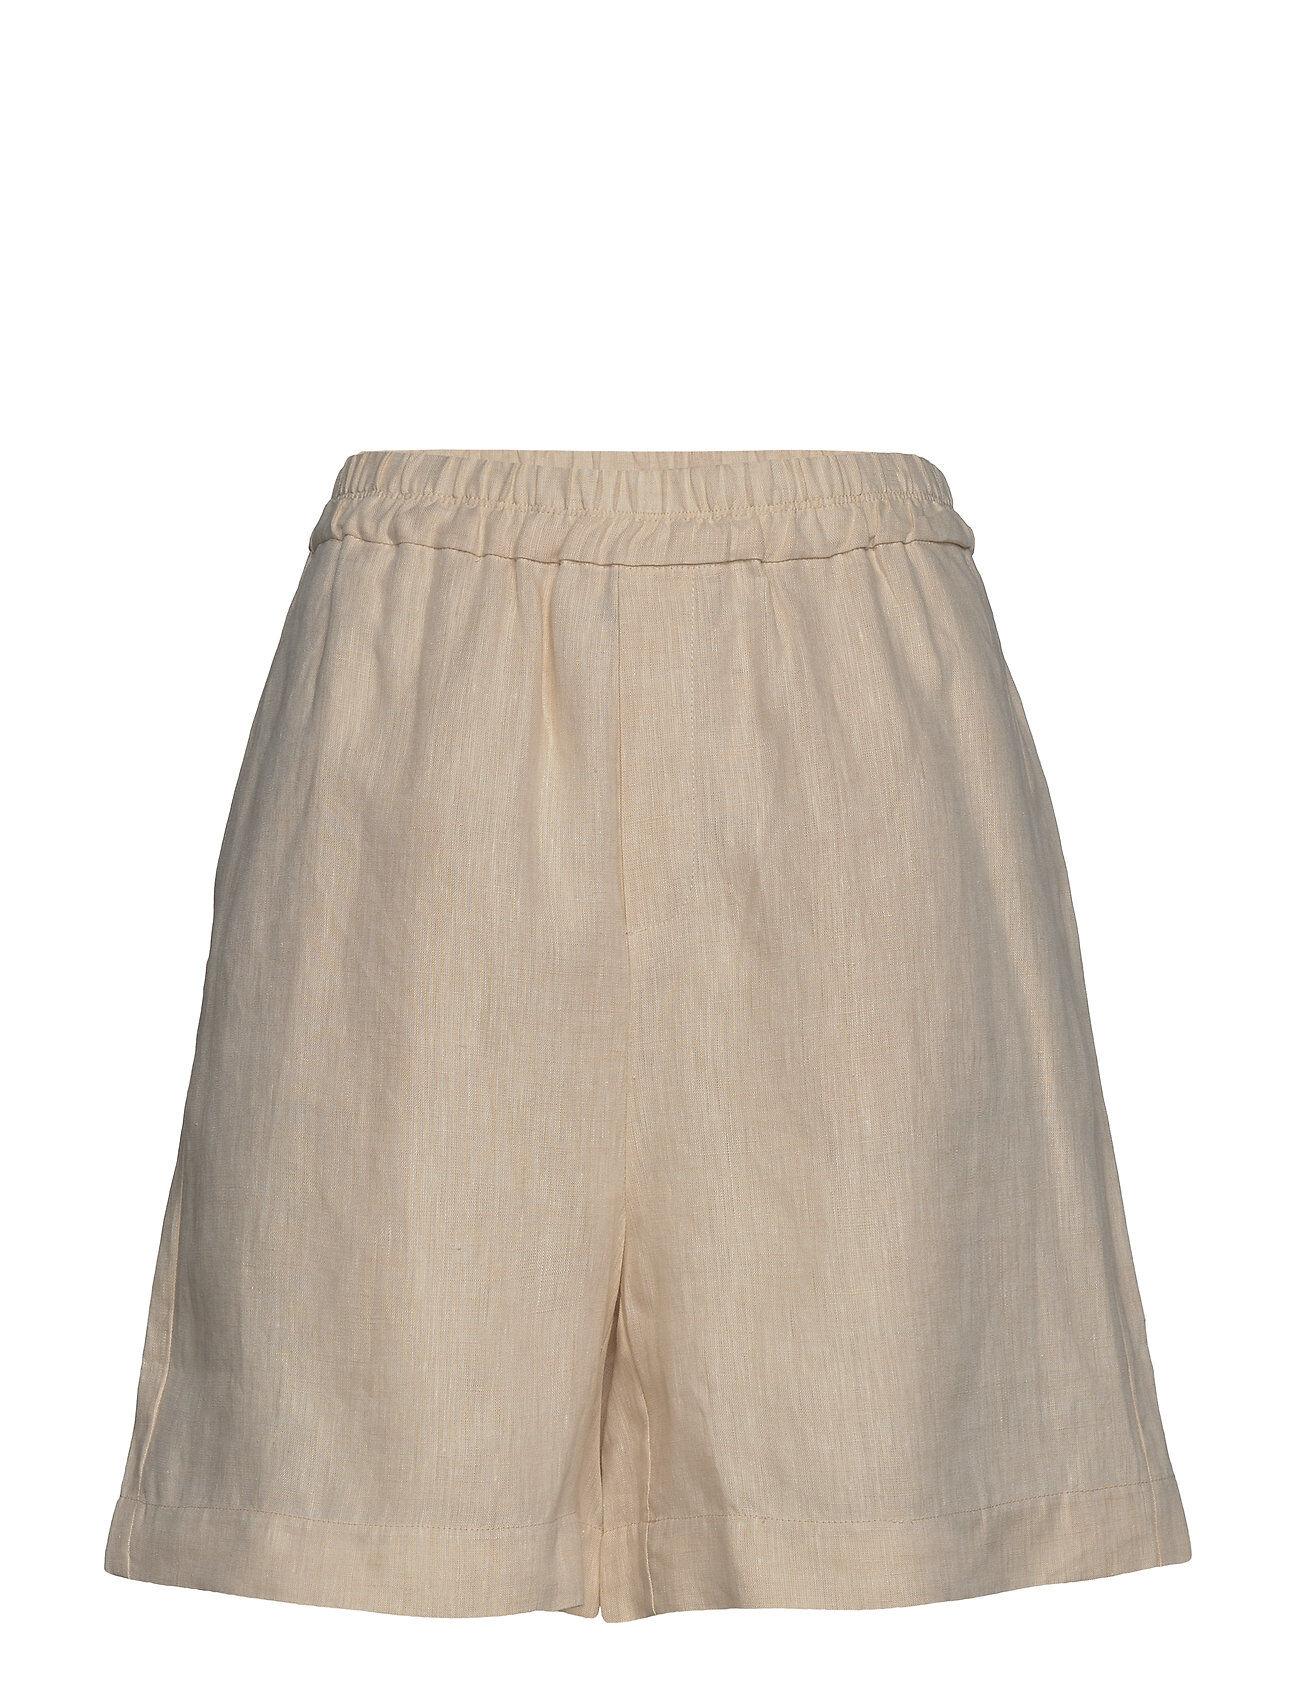 Noa Noa Shorts Shorts Flowy Shorts/Casual Shorts Beige Noa Noa